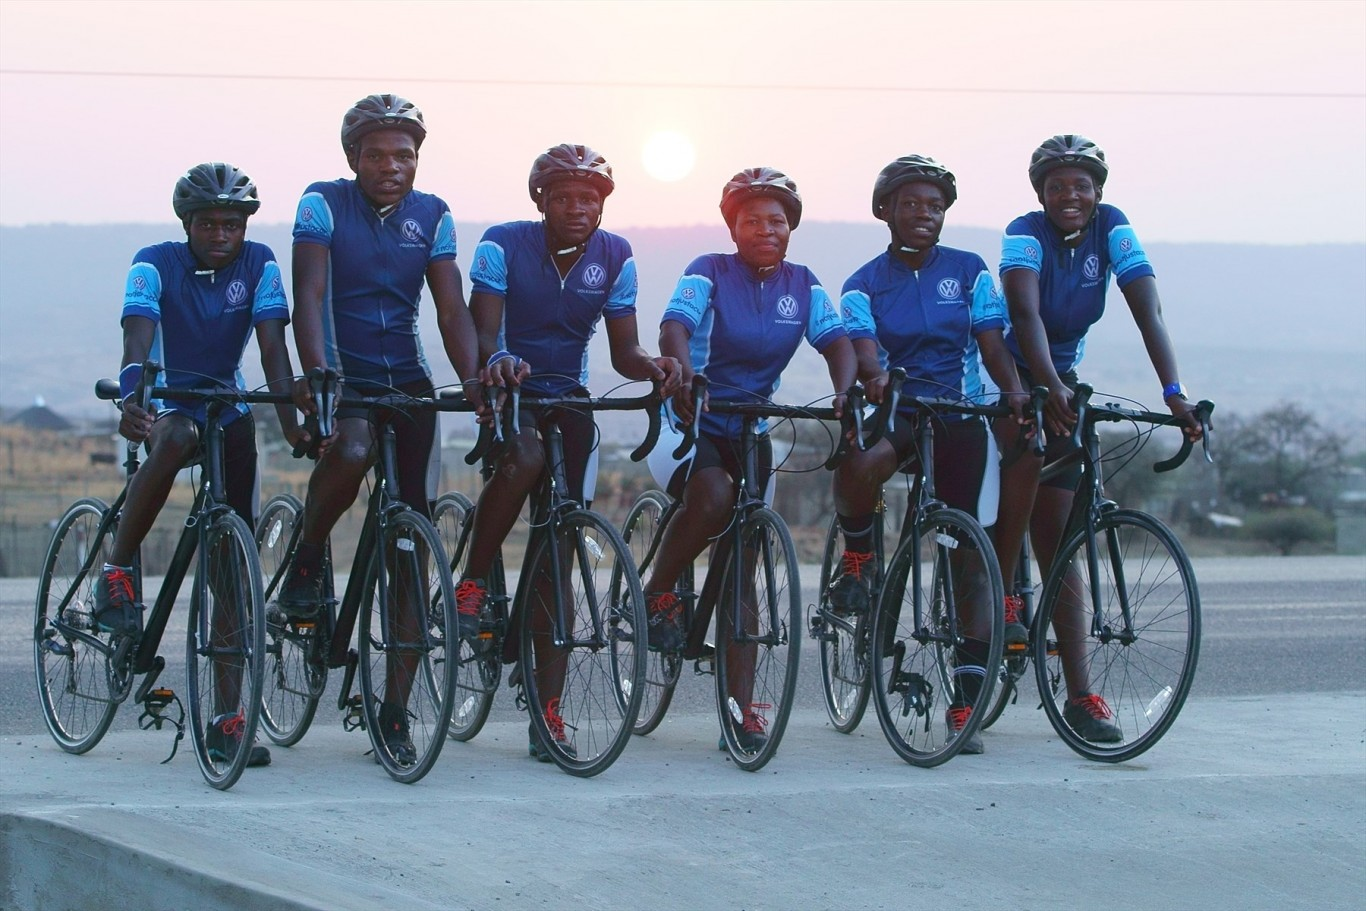 Siyaphambili Team to represent Volkswagen at Telkom 947 Cycle Challenge.